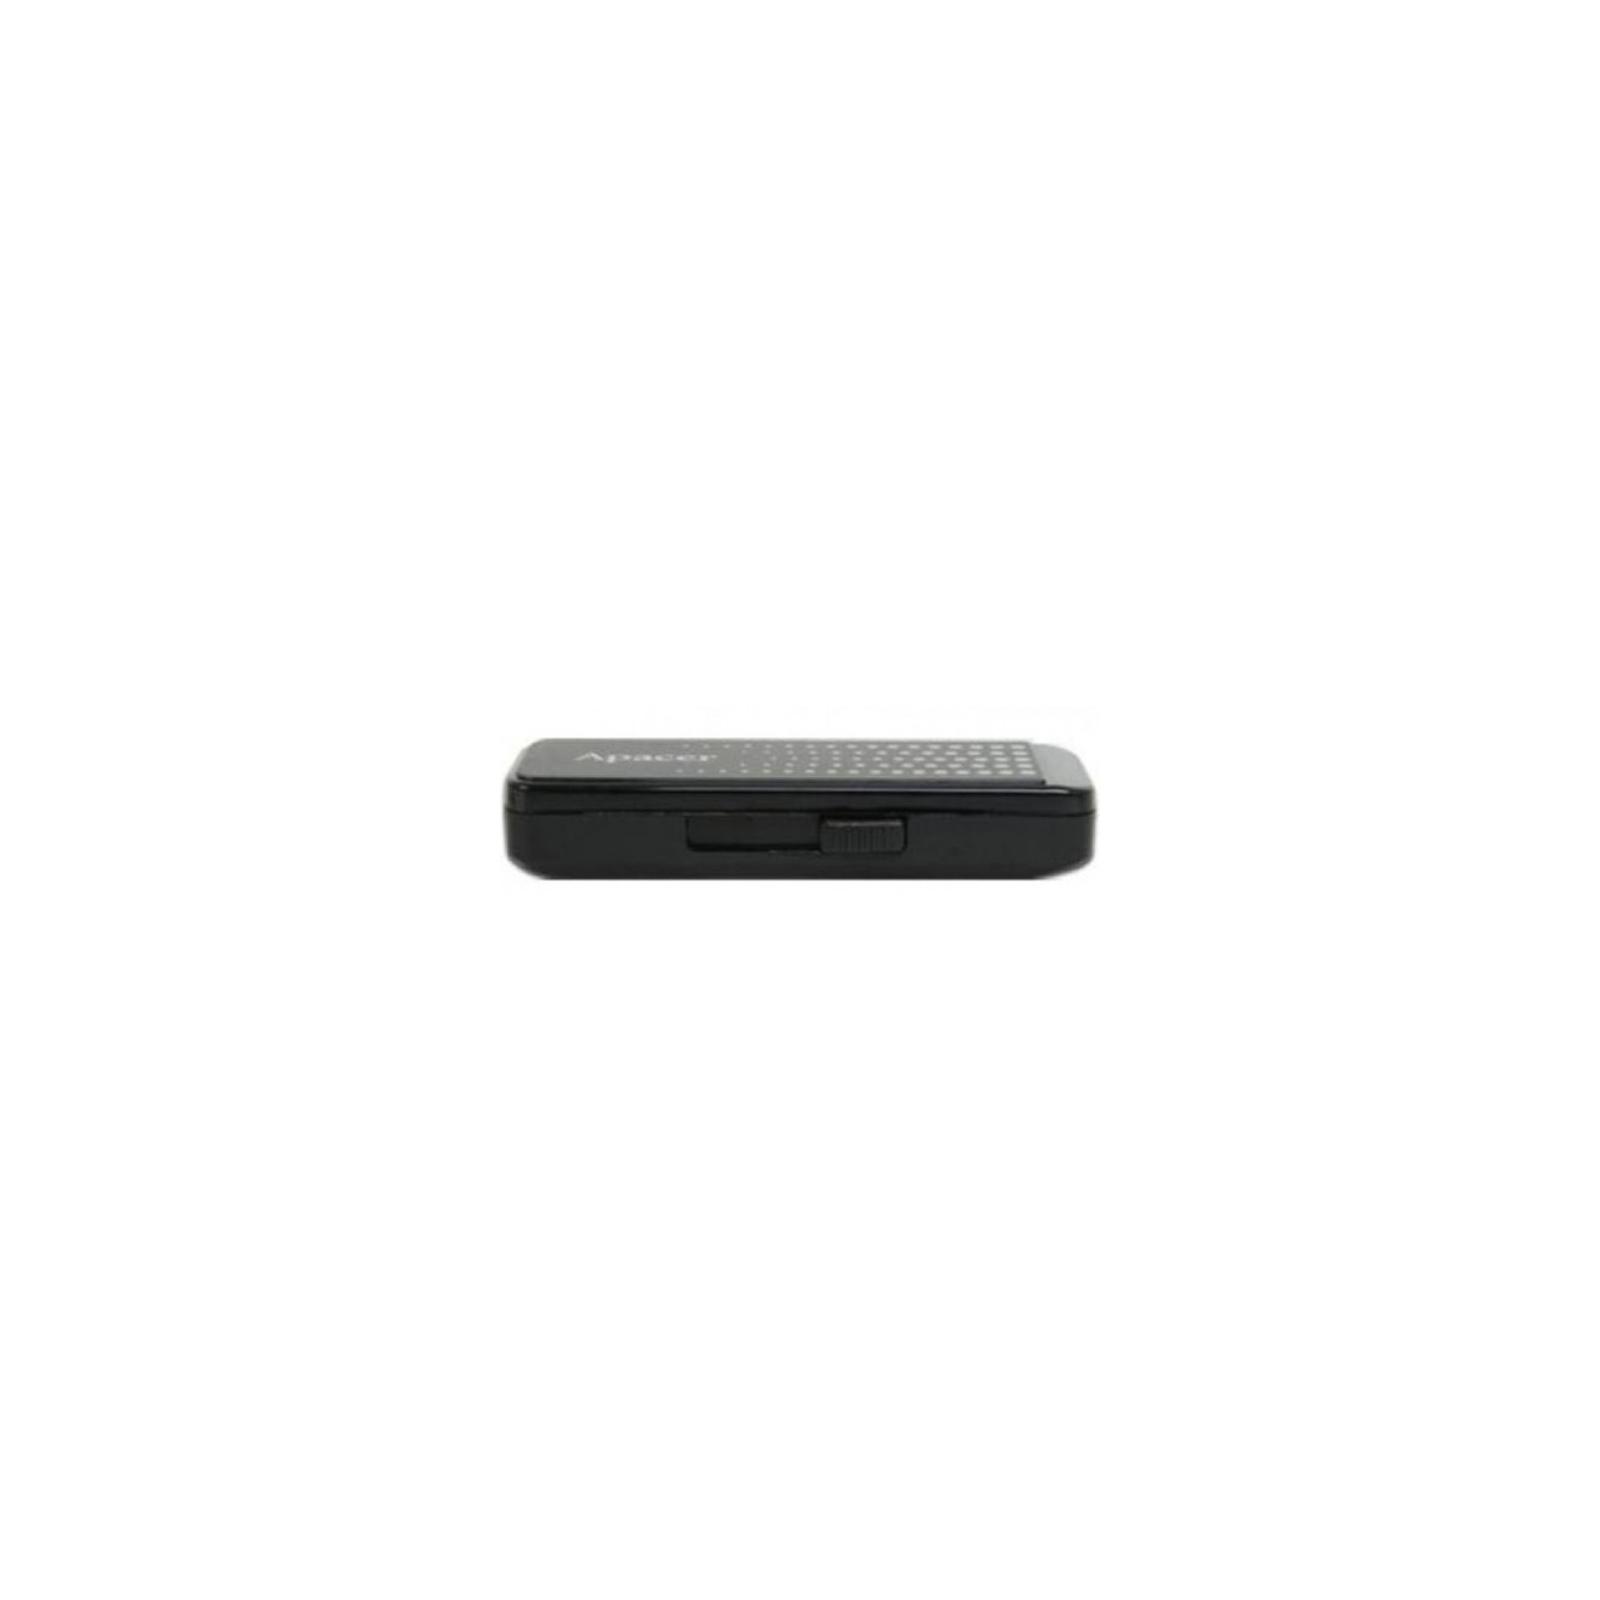 USB флеш накопитель Handy Steno AH323 black Apacer (AP8GAH323B-1) изображение 4